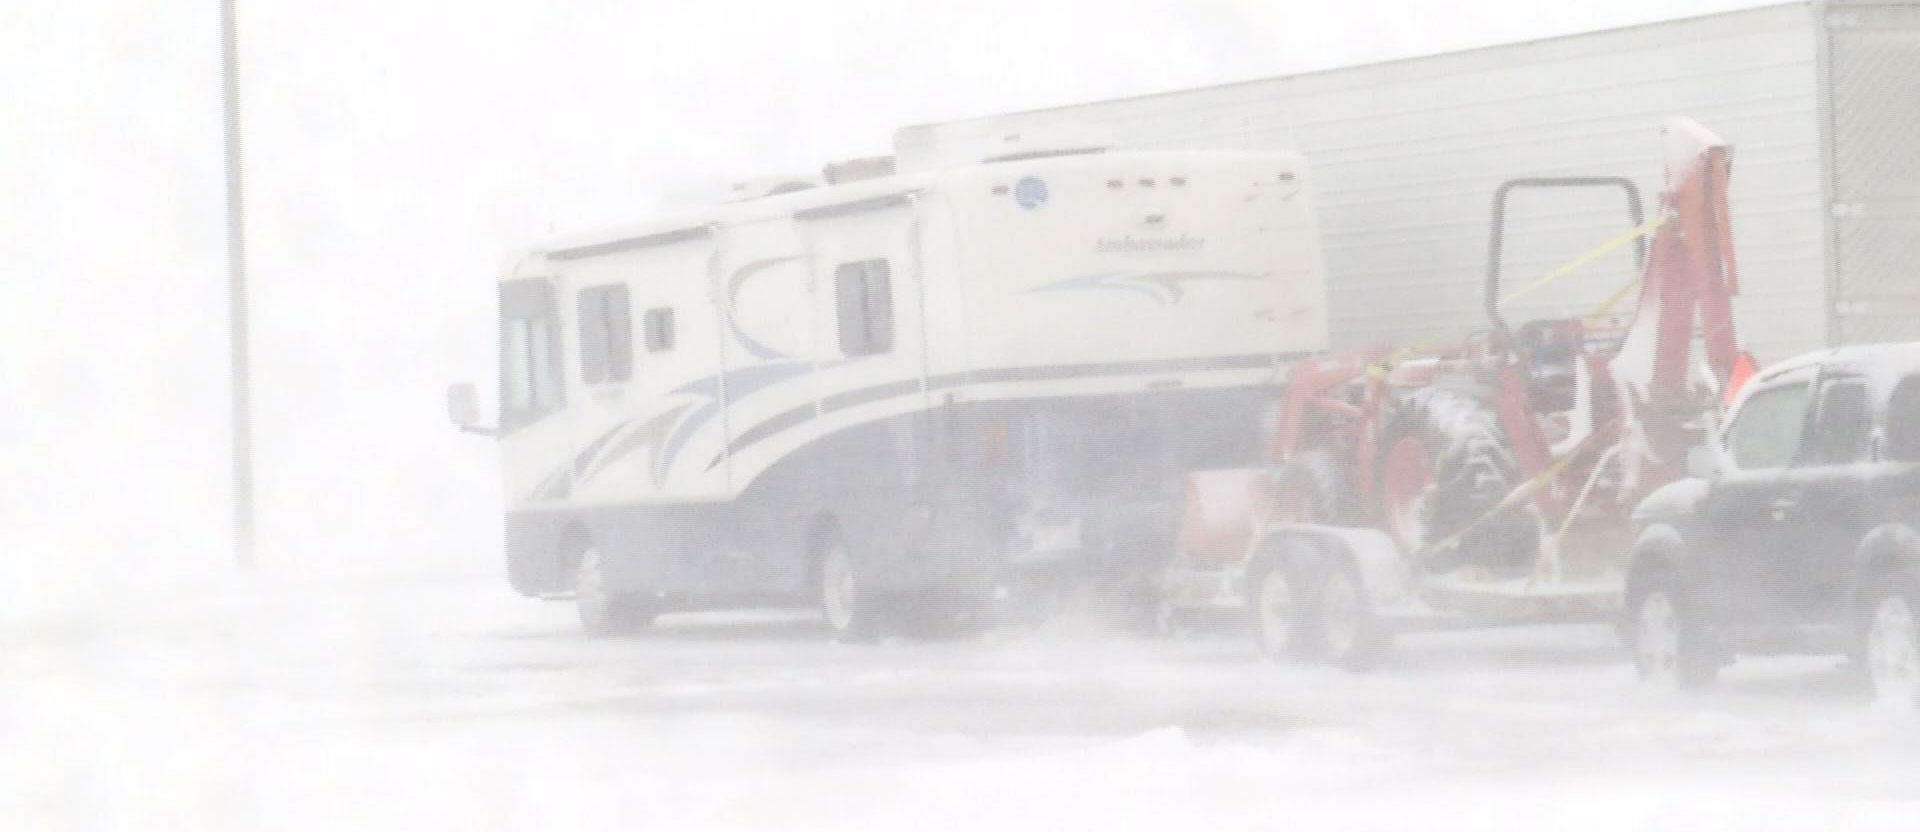 Salem Interstate 90 snow storm blizzard